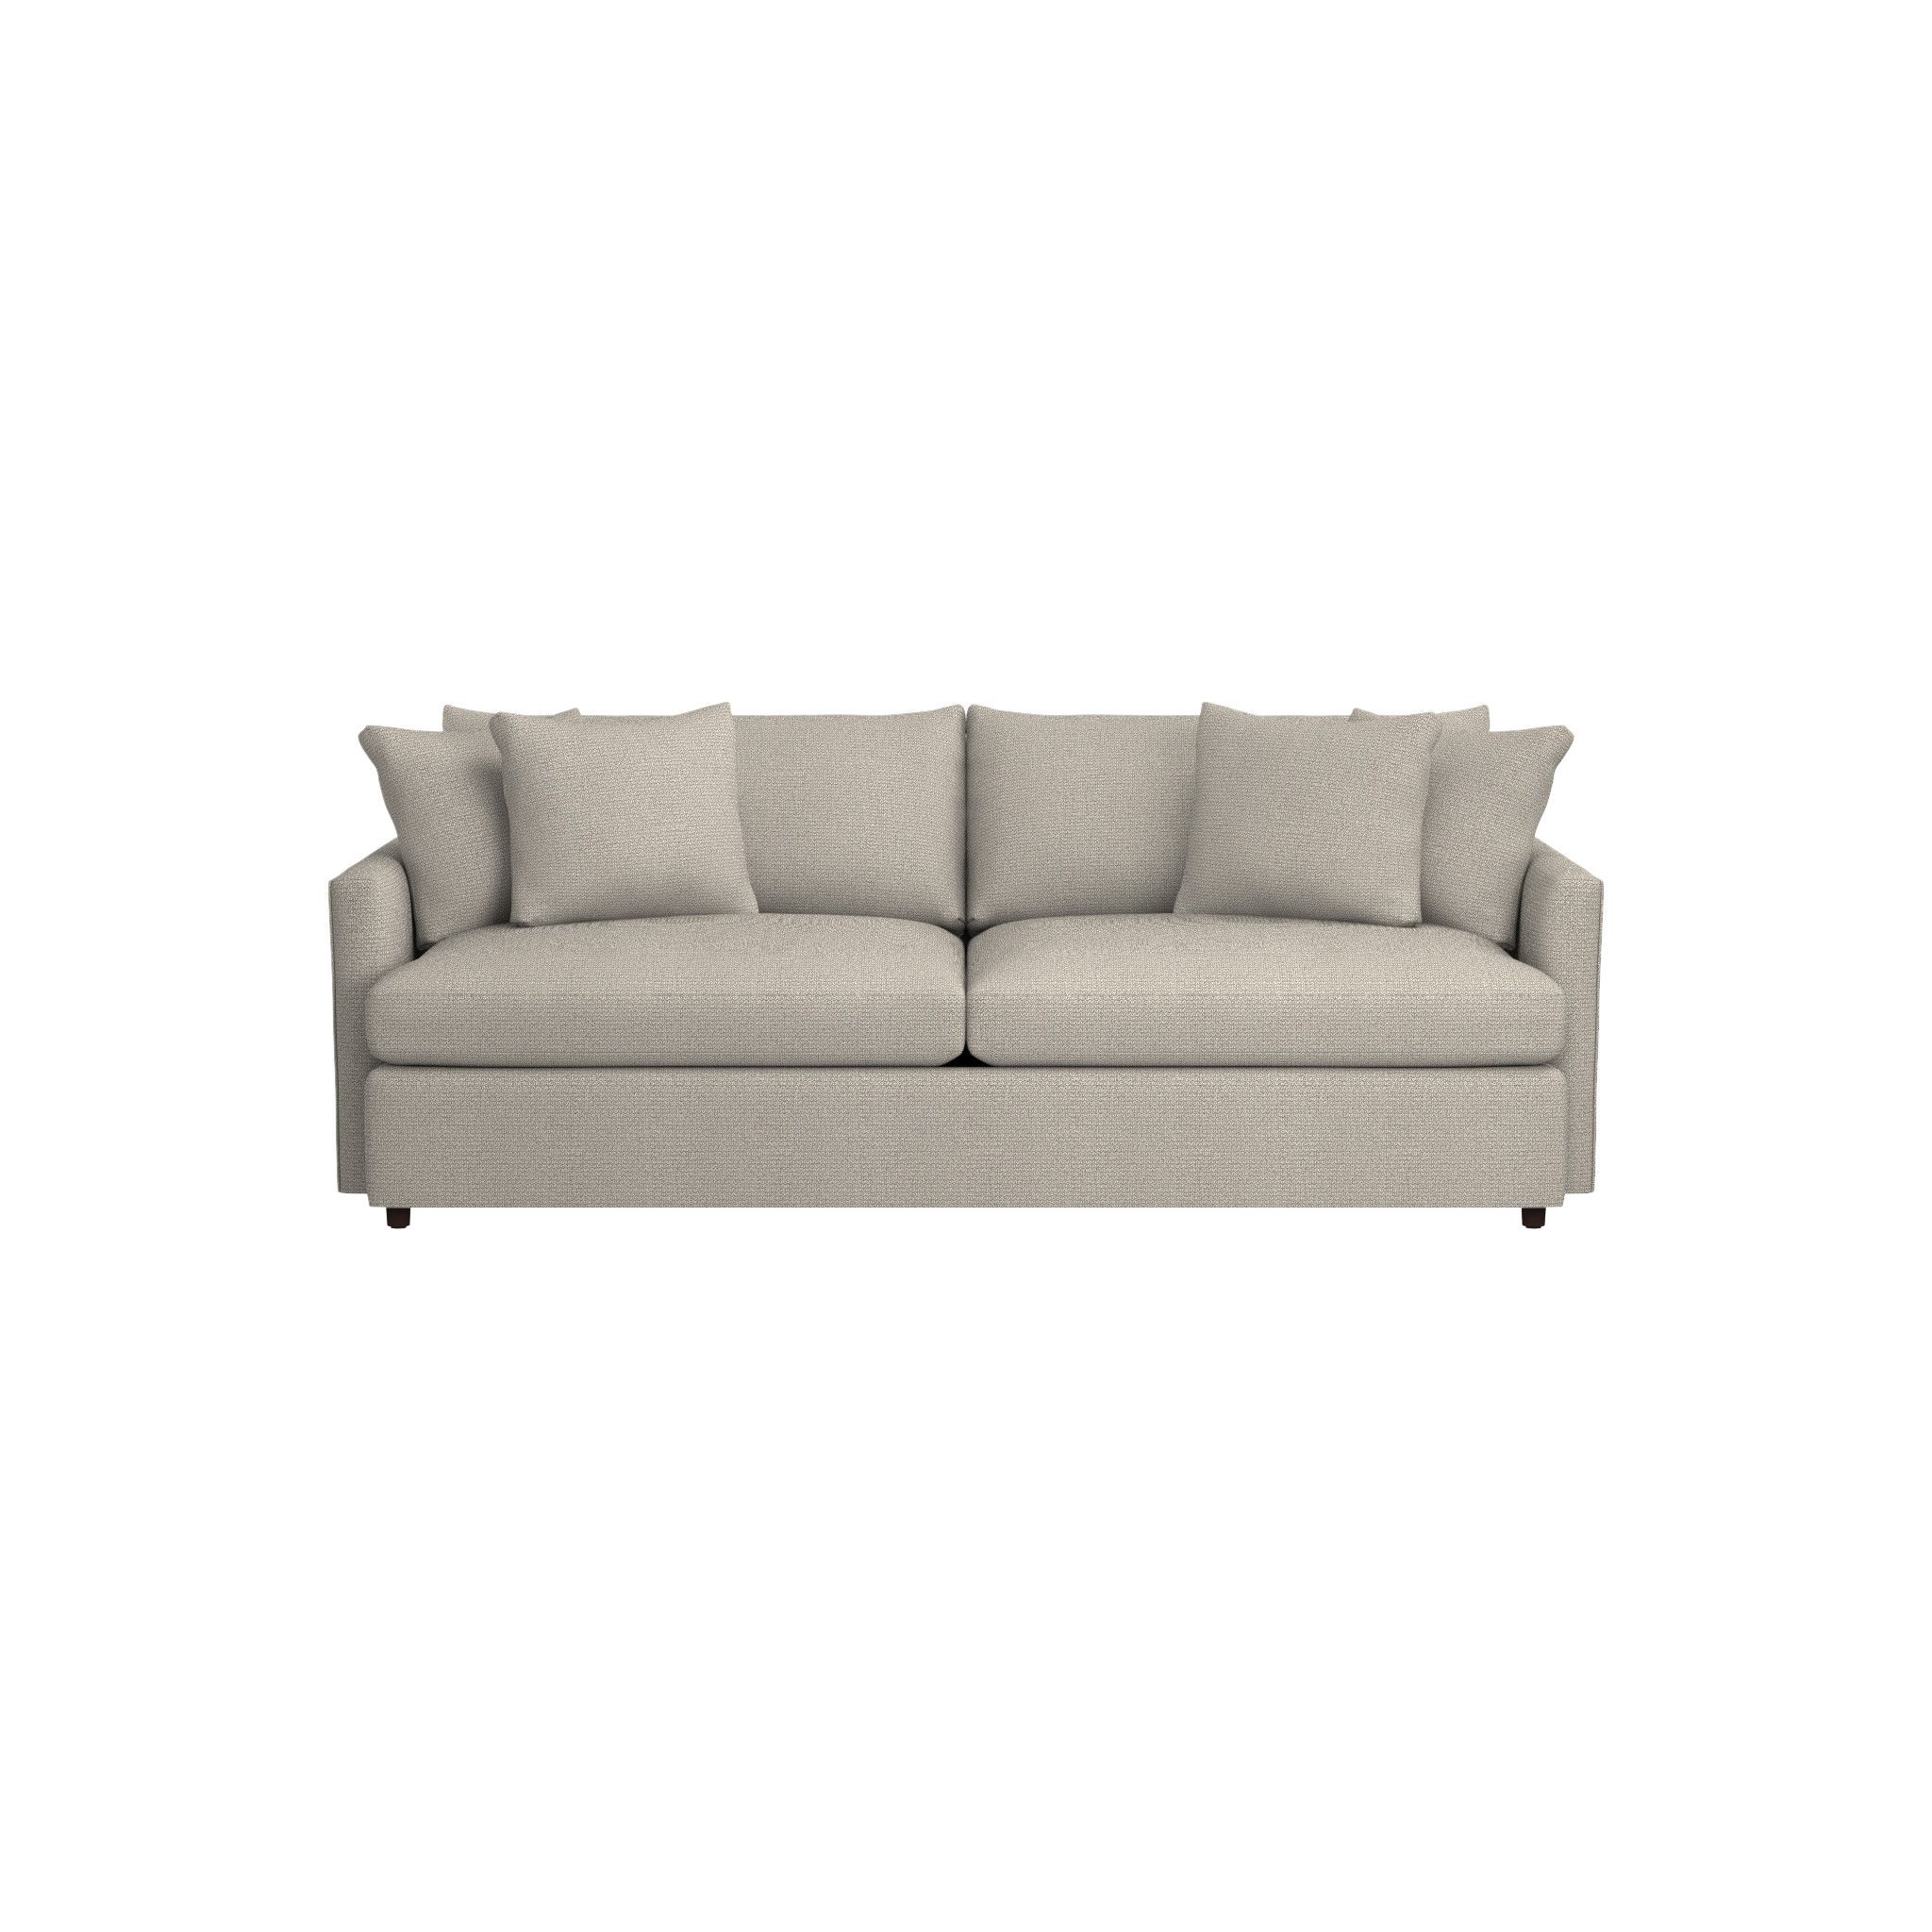 Lounge Ii 93 Sofa Reviews Crate And Barrel Sofa Furniture Sofa Furniture